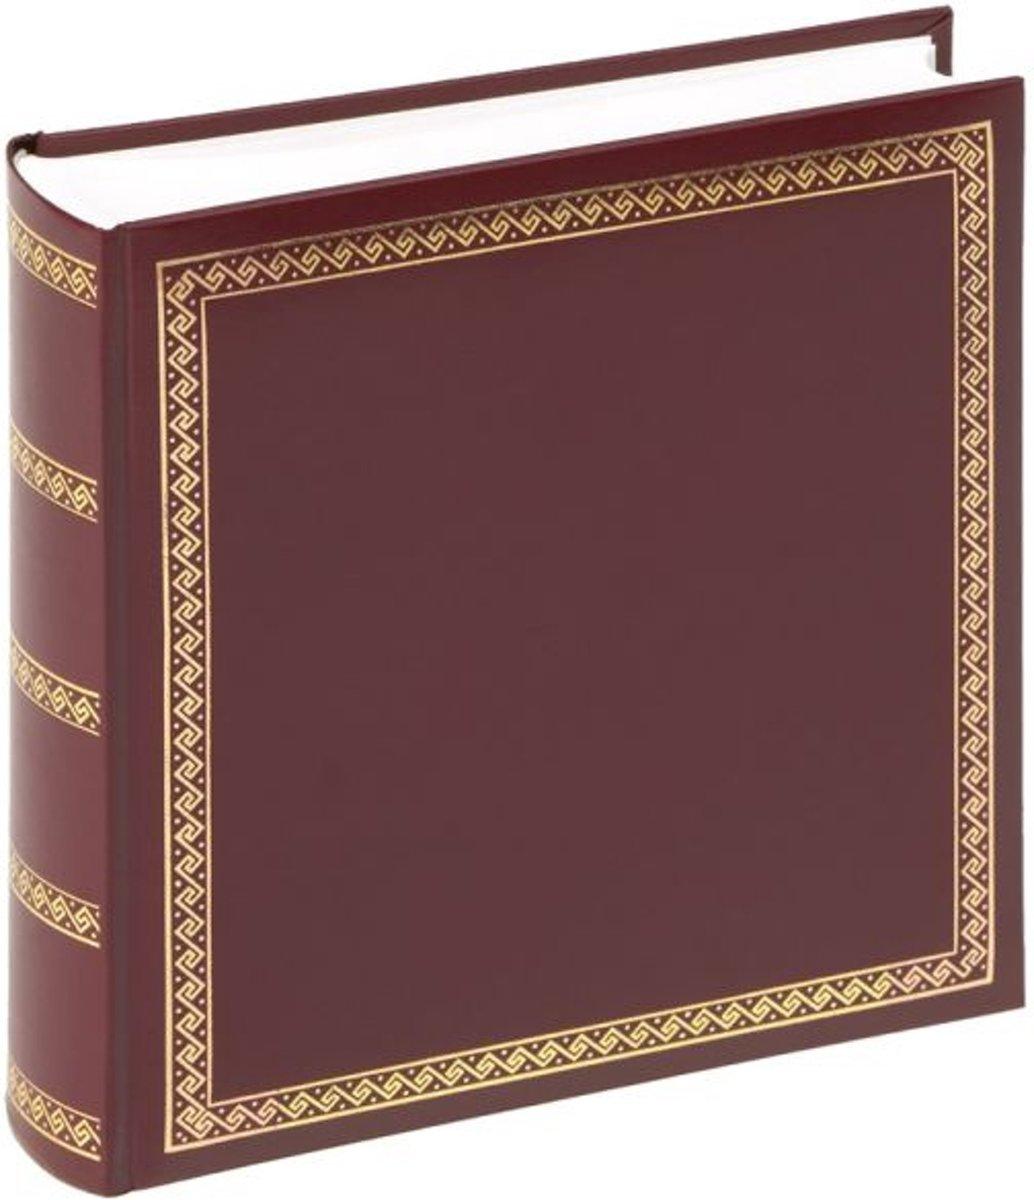 Walther Design Das schicke Dicke - Fotoalbum - 26 x 25 cm - Rood - 100 pagina's